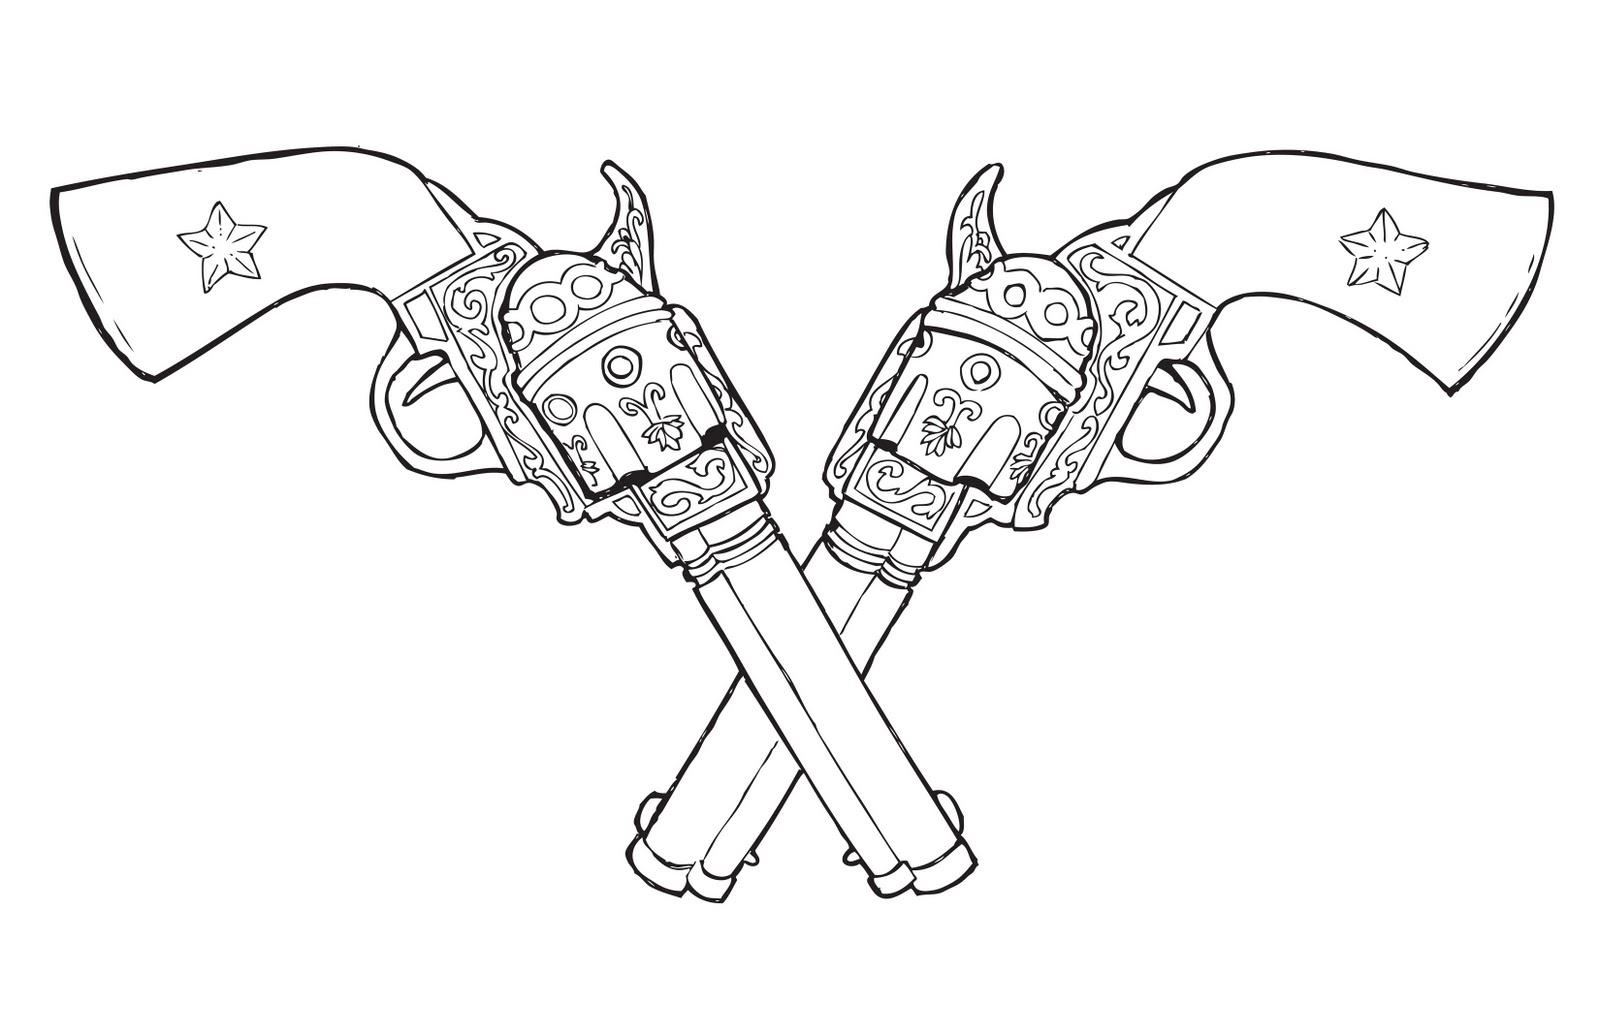 Tattoo Machine by loneuglyfish on DeviantArt  |Tattoo Gun Drawing